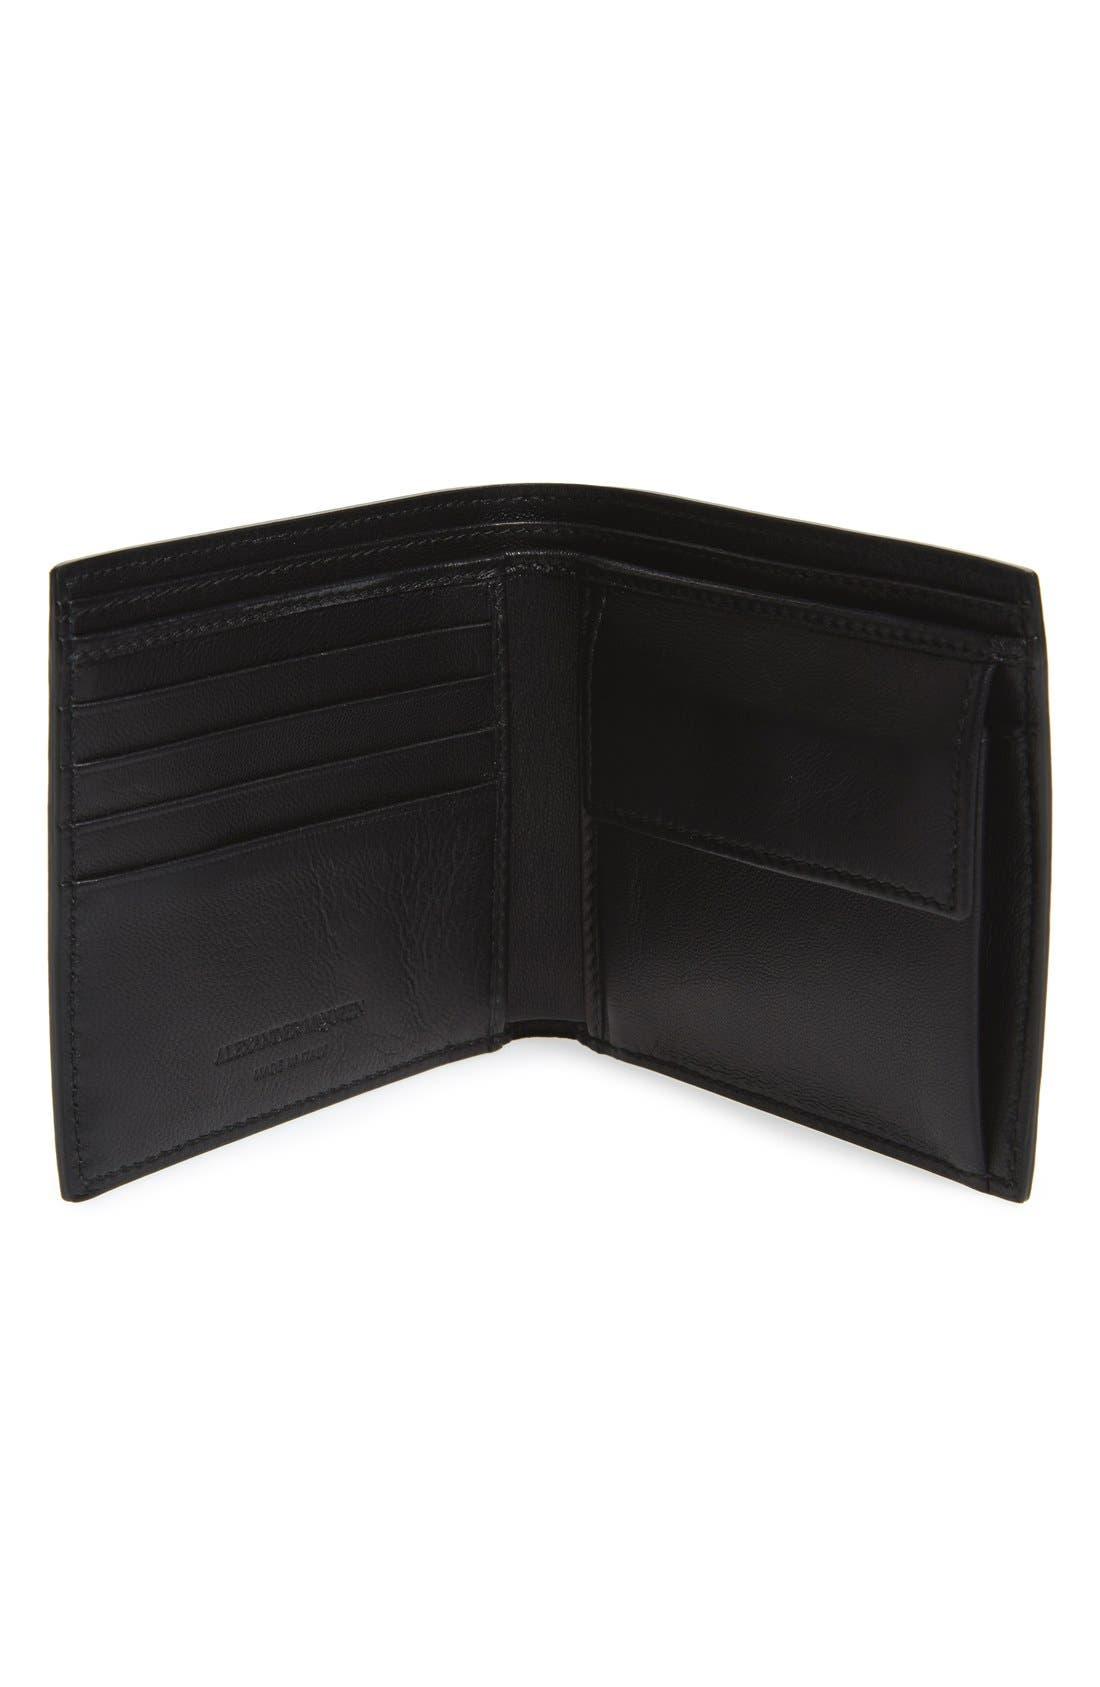 Ribcage Leather Wallet,                             Alternate thumbnail 2, color,                             Black